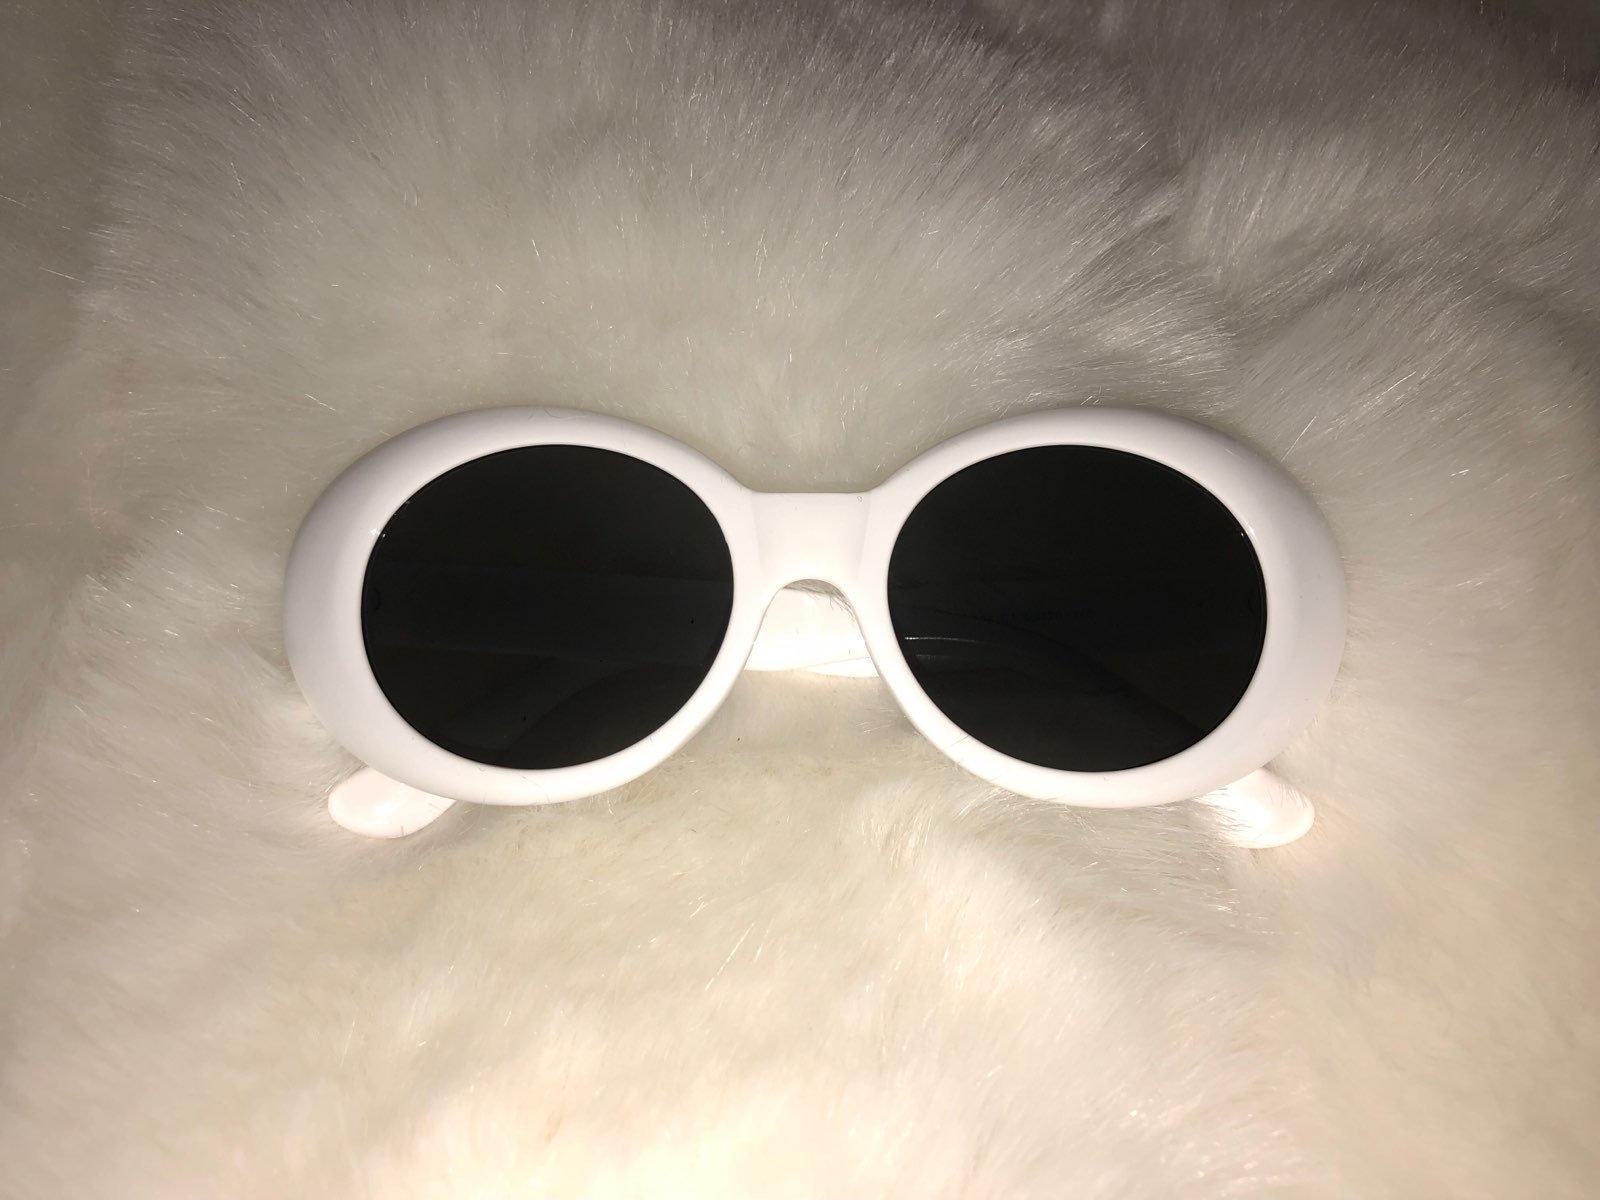 edb6ee8a84d45 Snow White Sunglasses